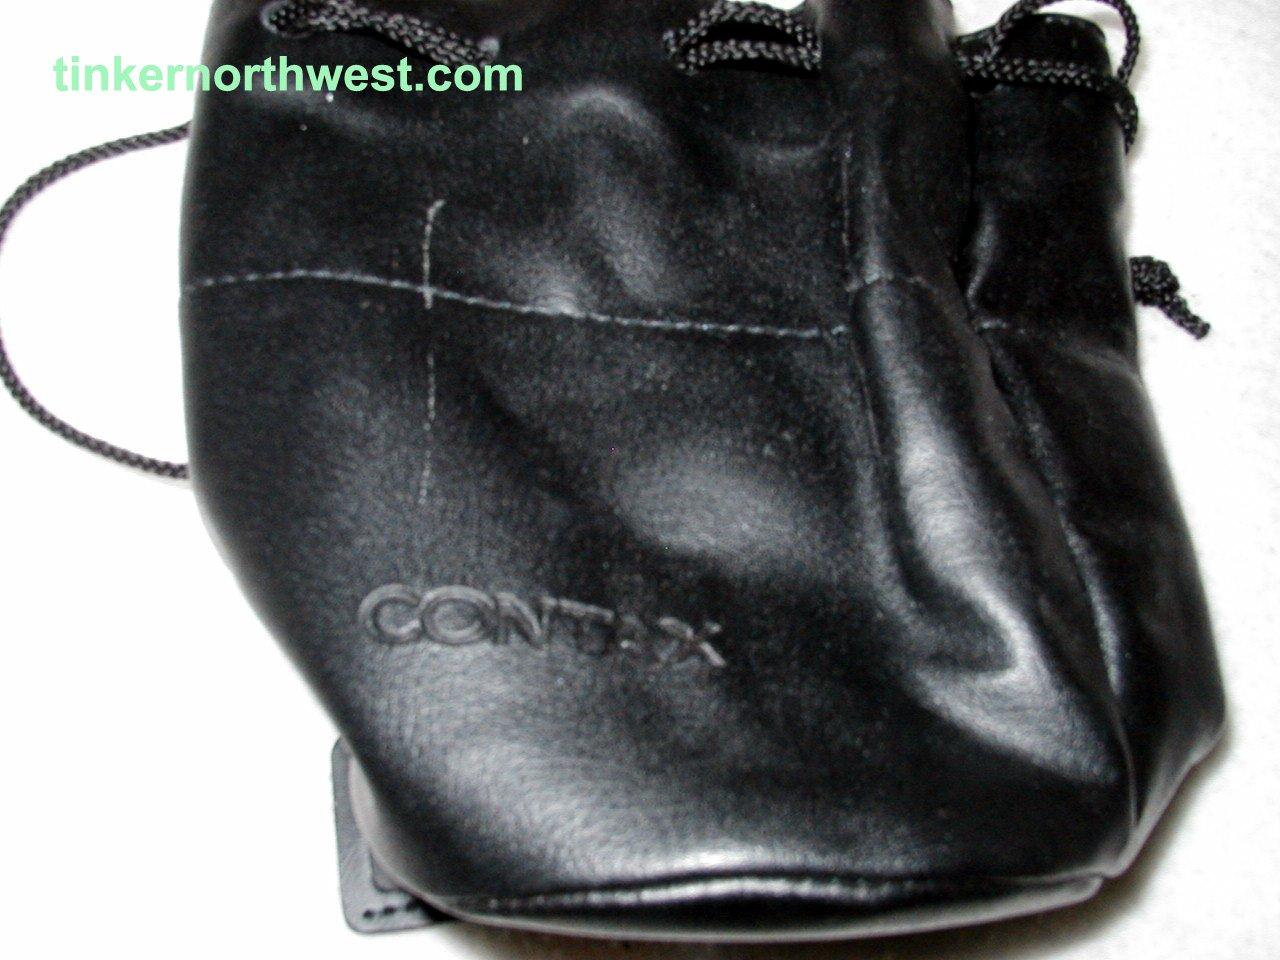 Contax Soft Lens Case 4